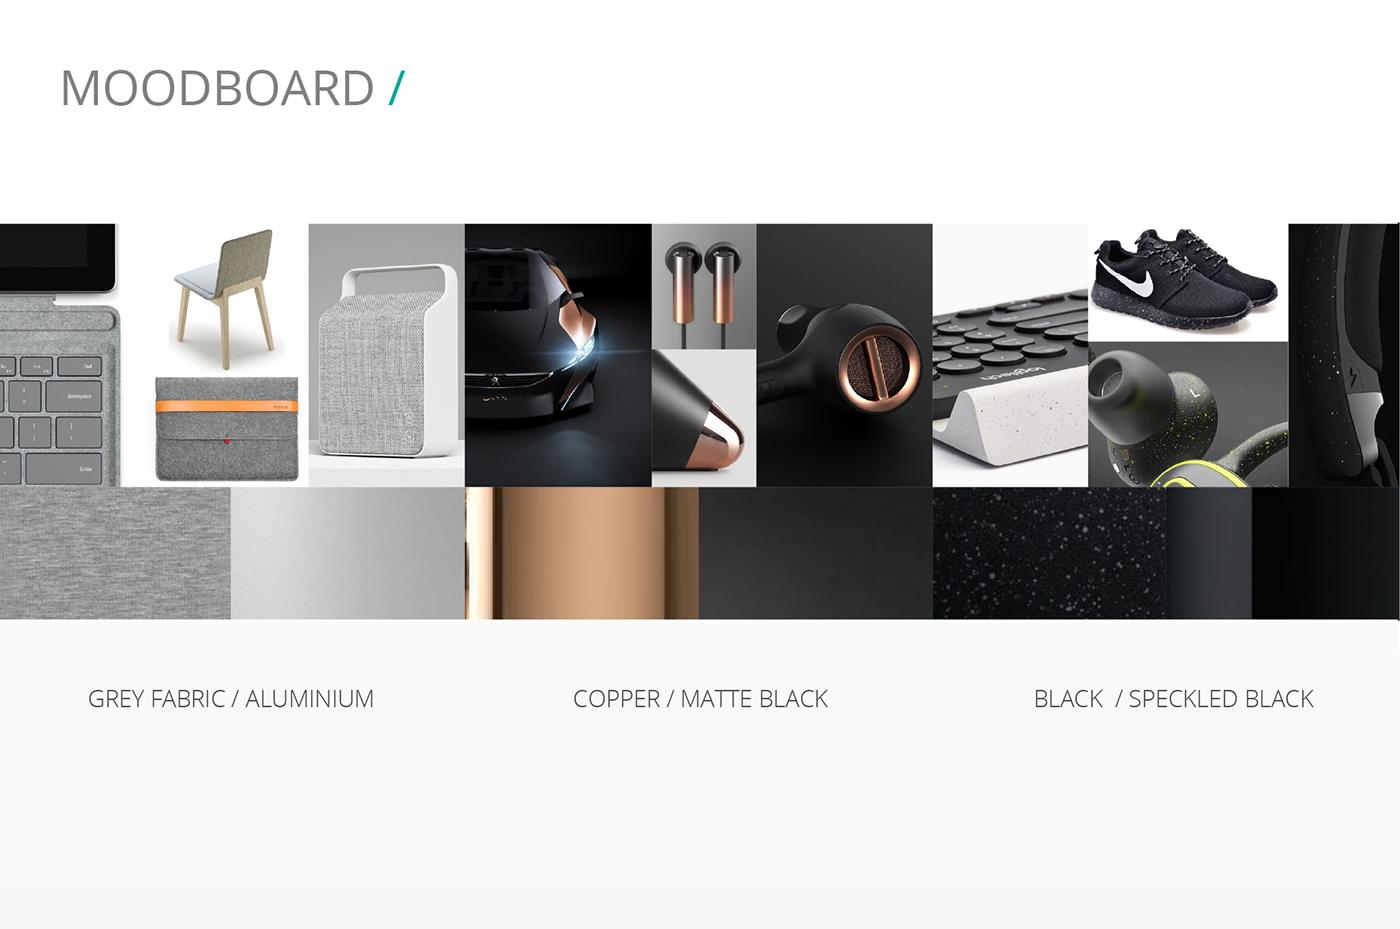 smartphone huawei product design  industrial design  mobile concept borderless smartphone design high-tech